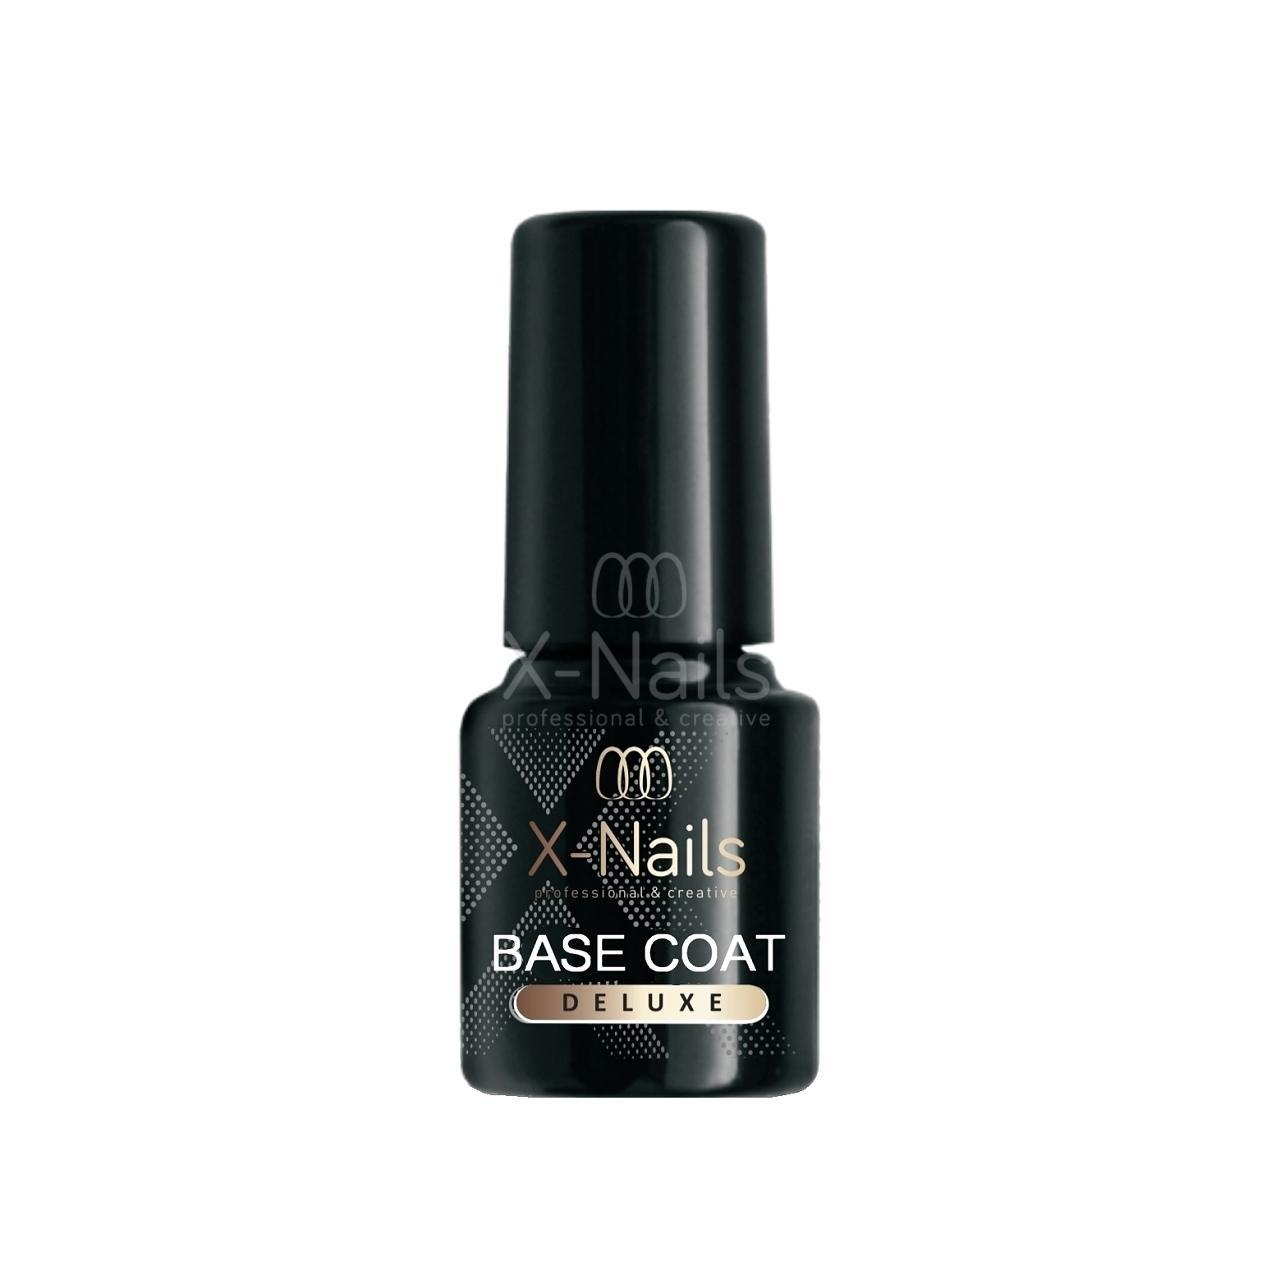 Podkladova Baze Na Nehty Podlak Gel Lak Base Coat Deluxe X Nails